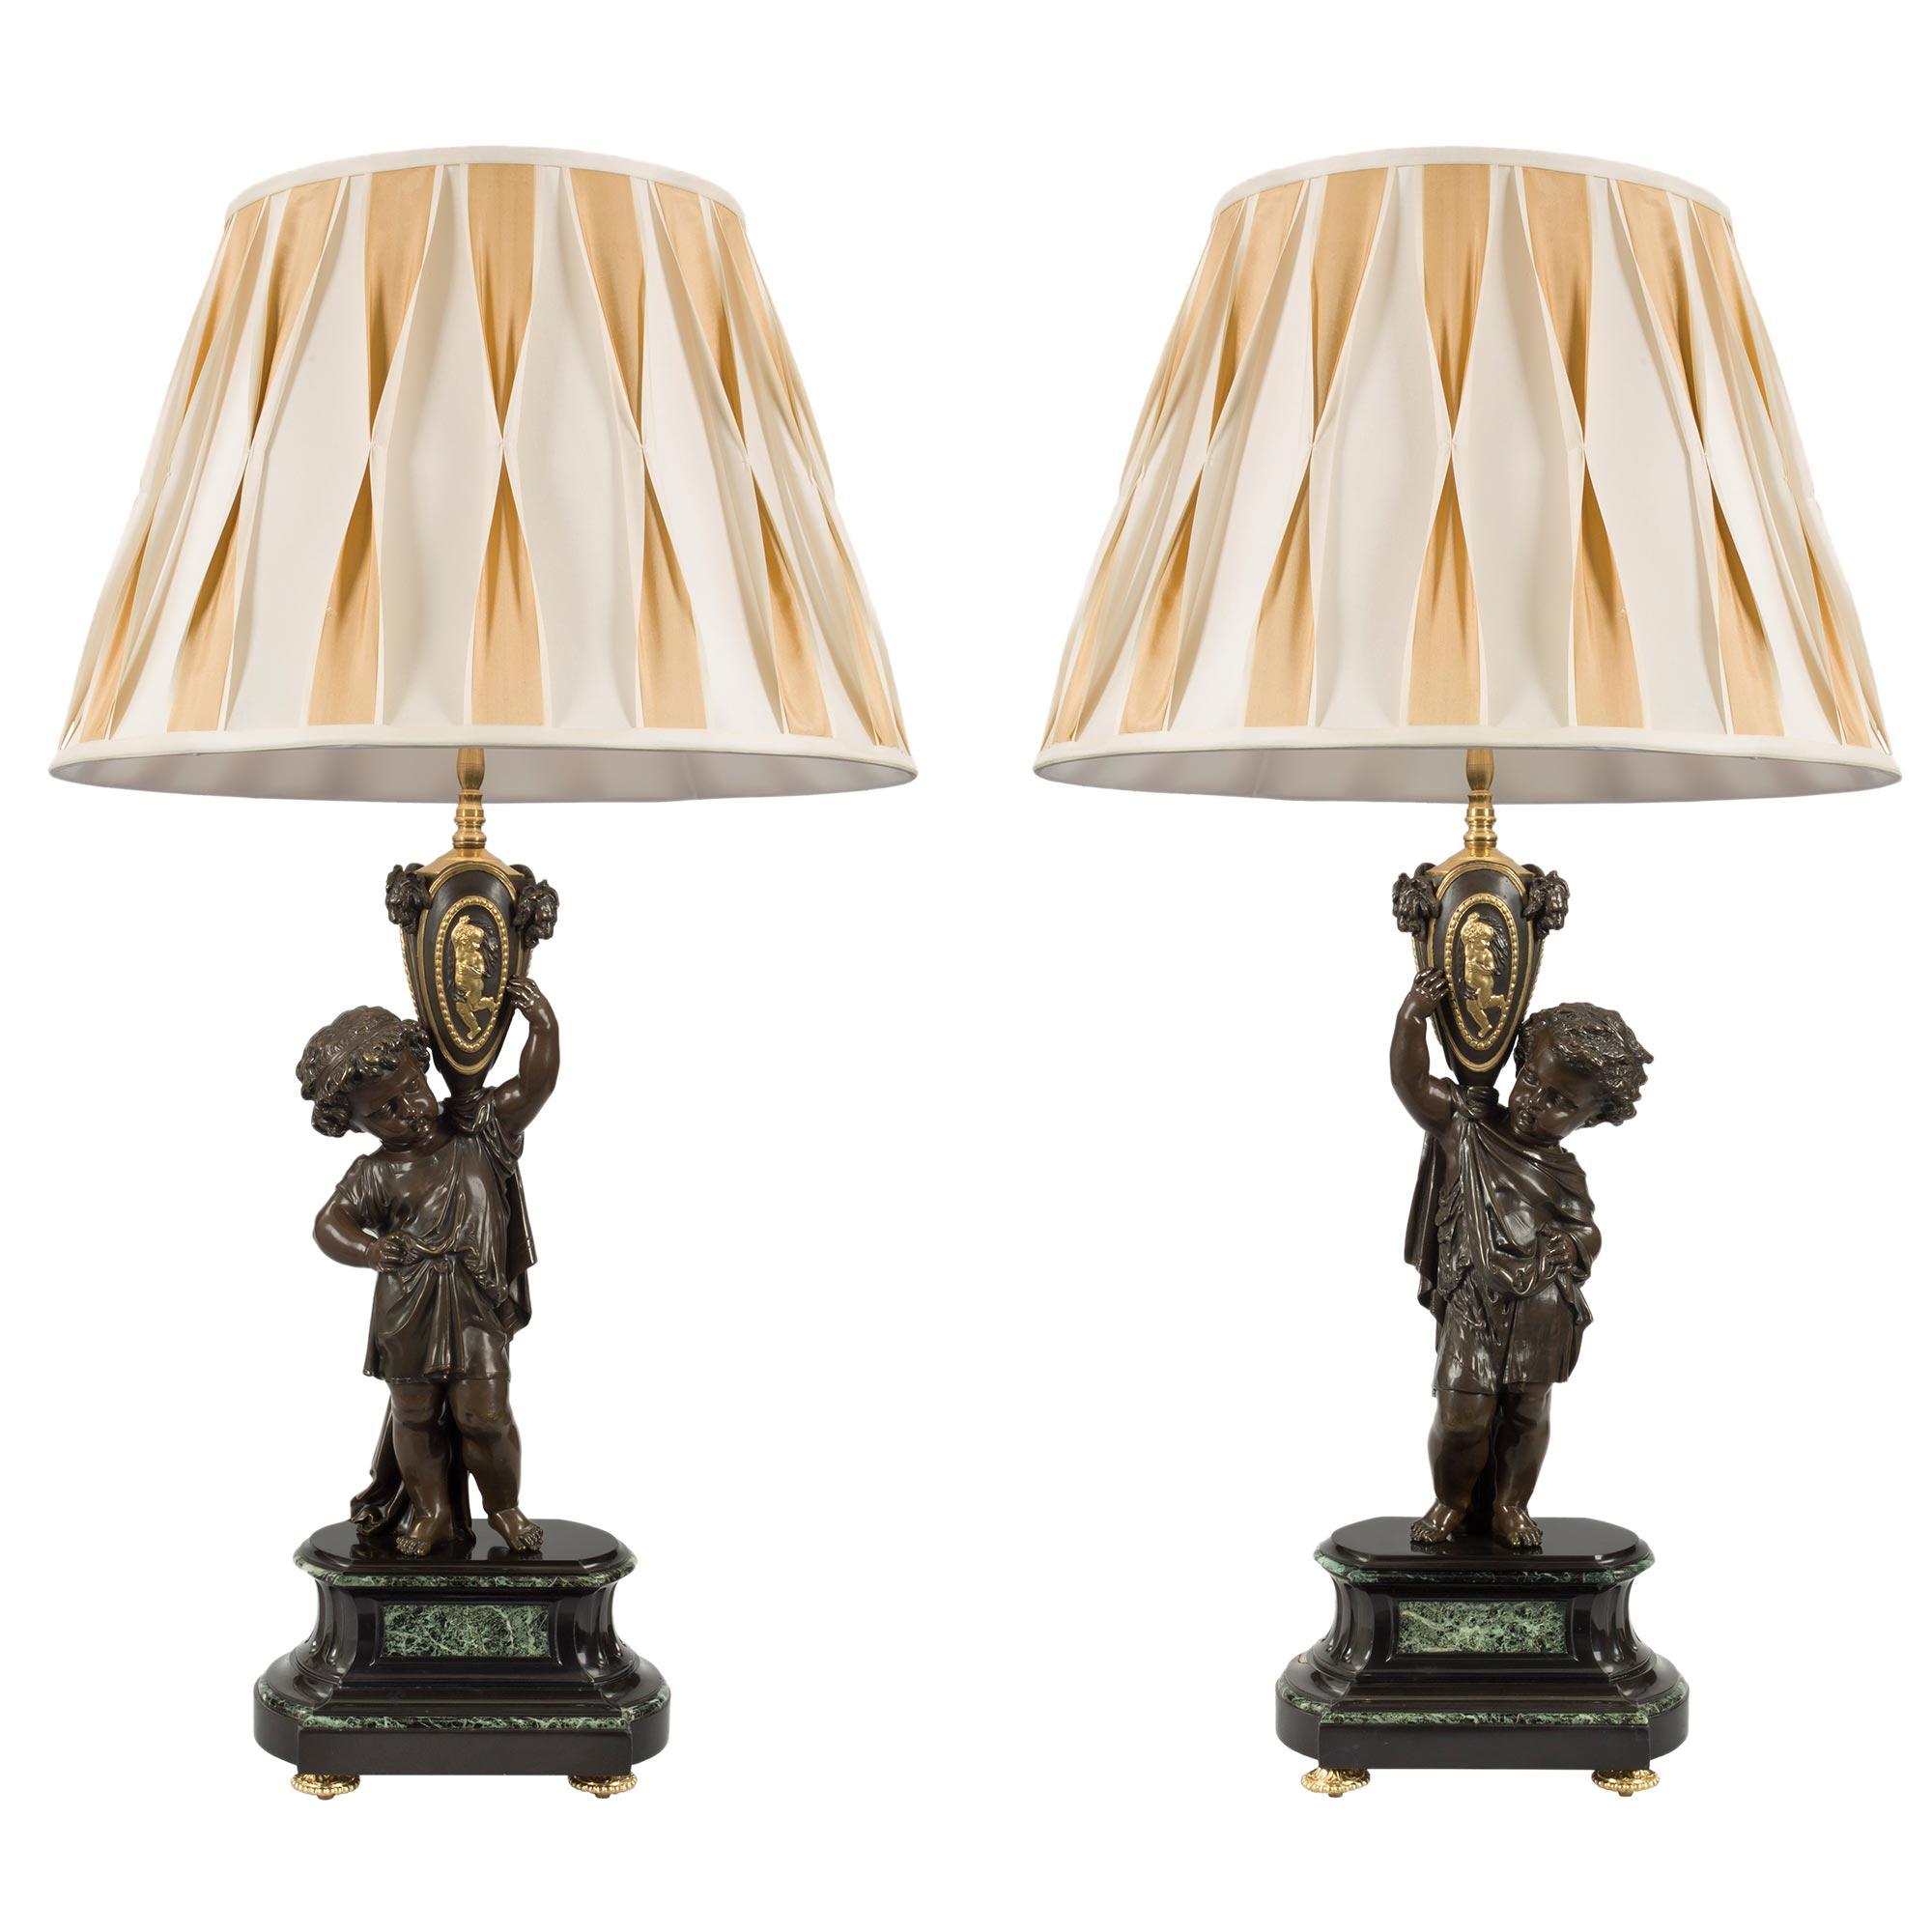 Pair of French 19th Century Louis XVI St. Belle Époque Period Lamps